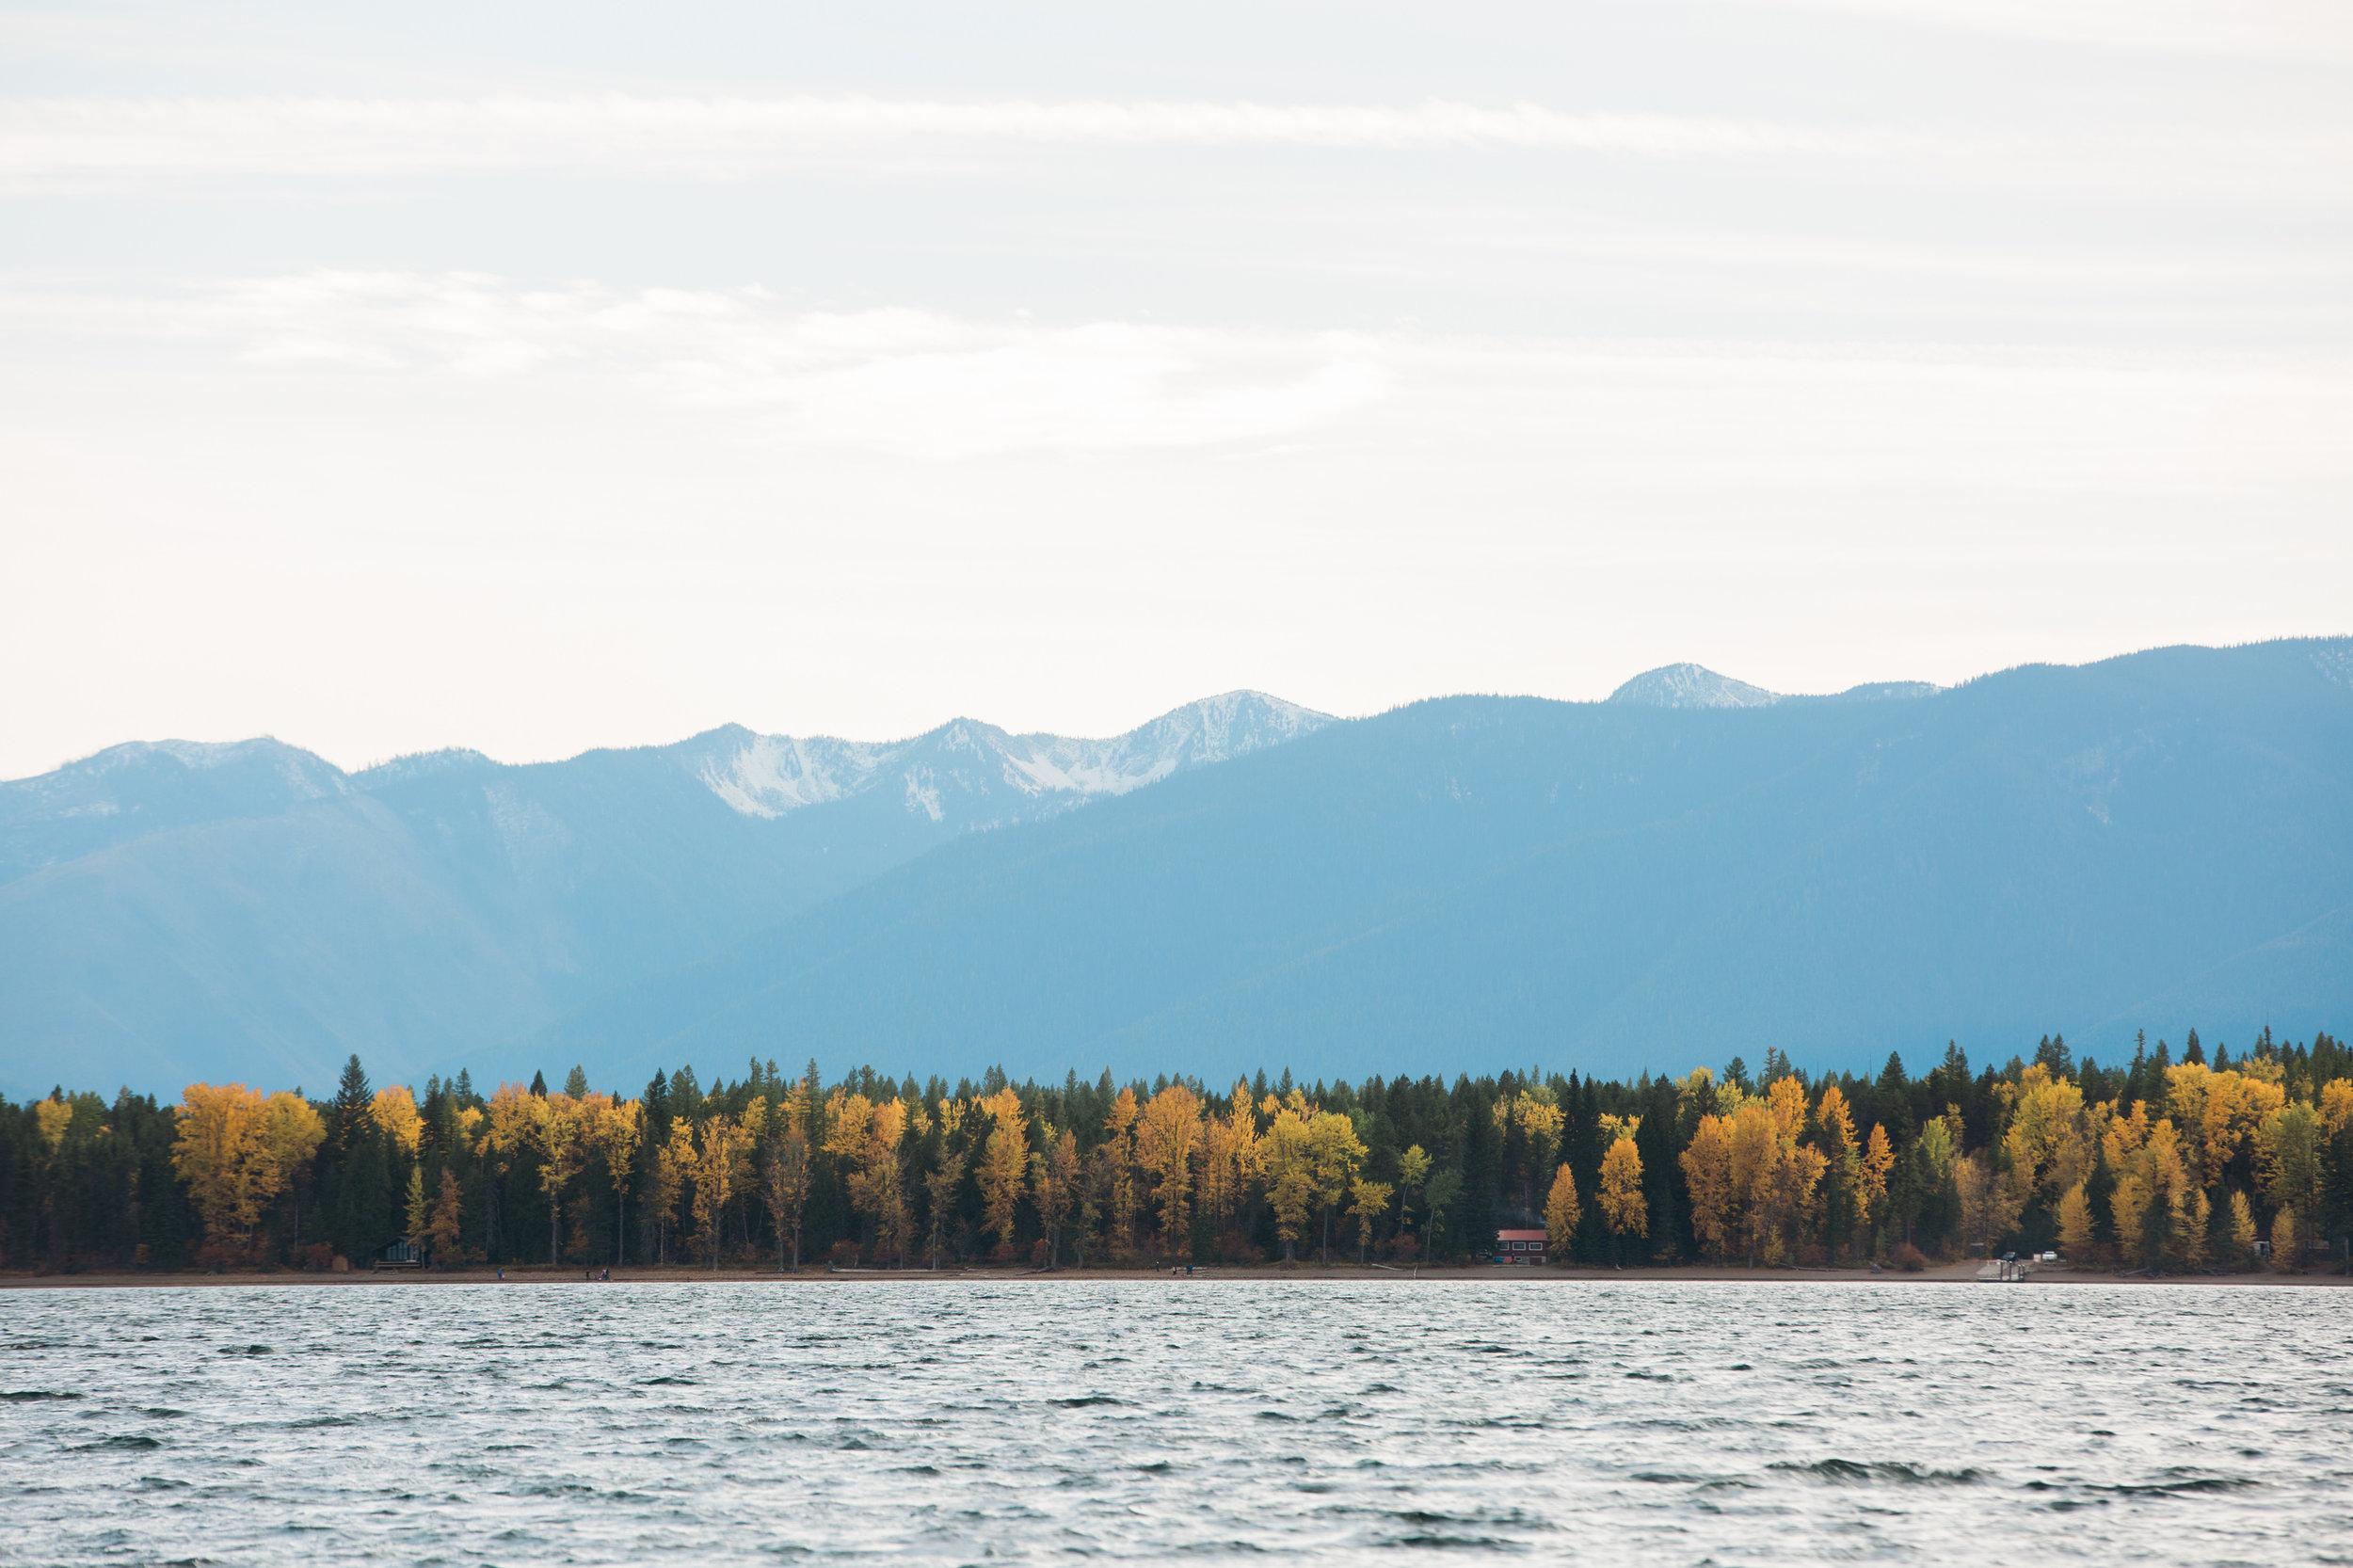 CindyGiovagnoli_Glacier_National_Park_Montana_mountains_lake_fall_autumn_road_trip-008.jpg